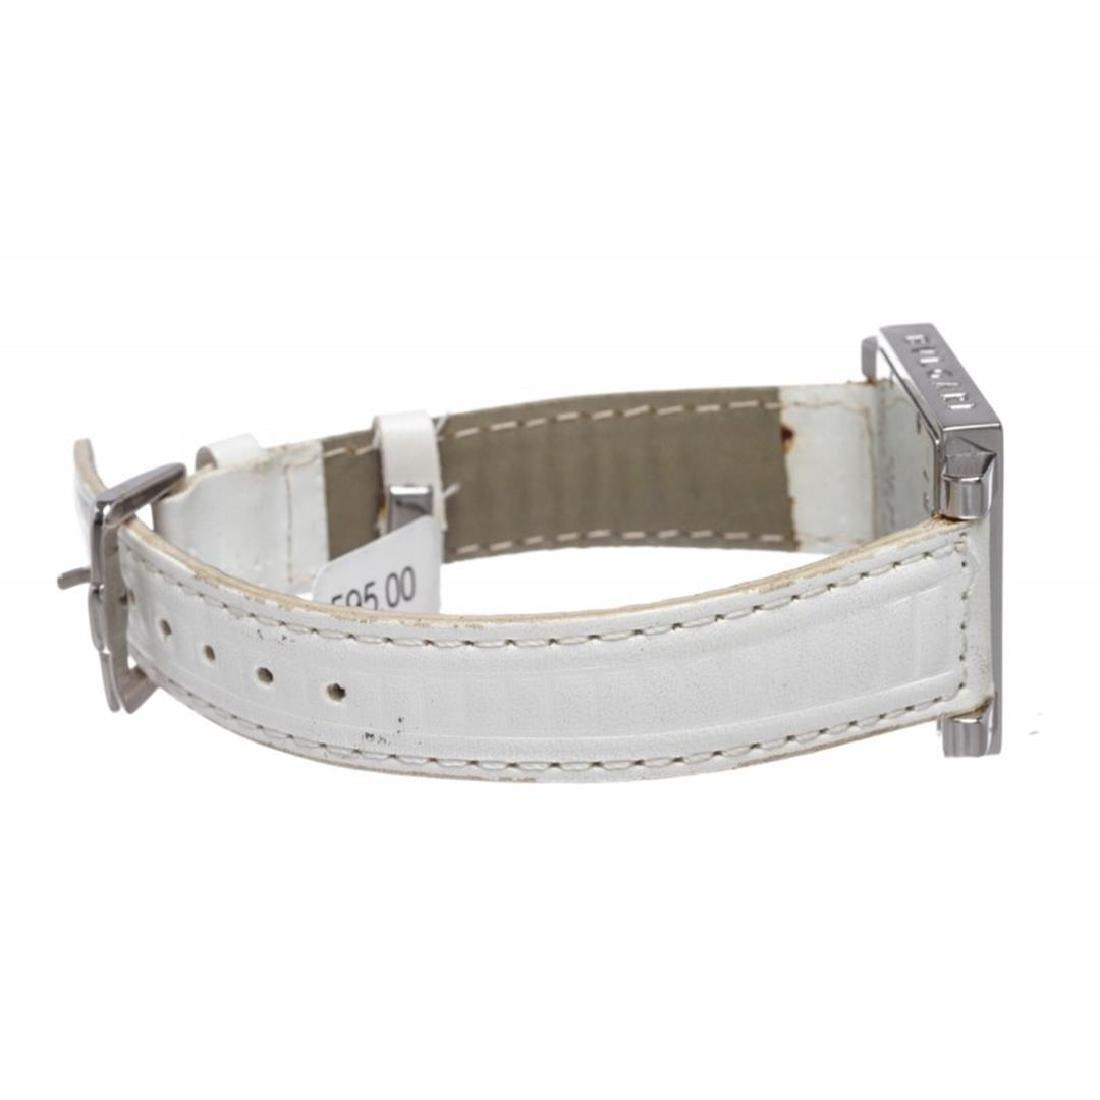 Bvlgari White SQ 29 SLD Stainless Steel Square Ladies - 3